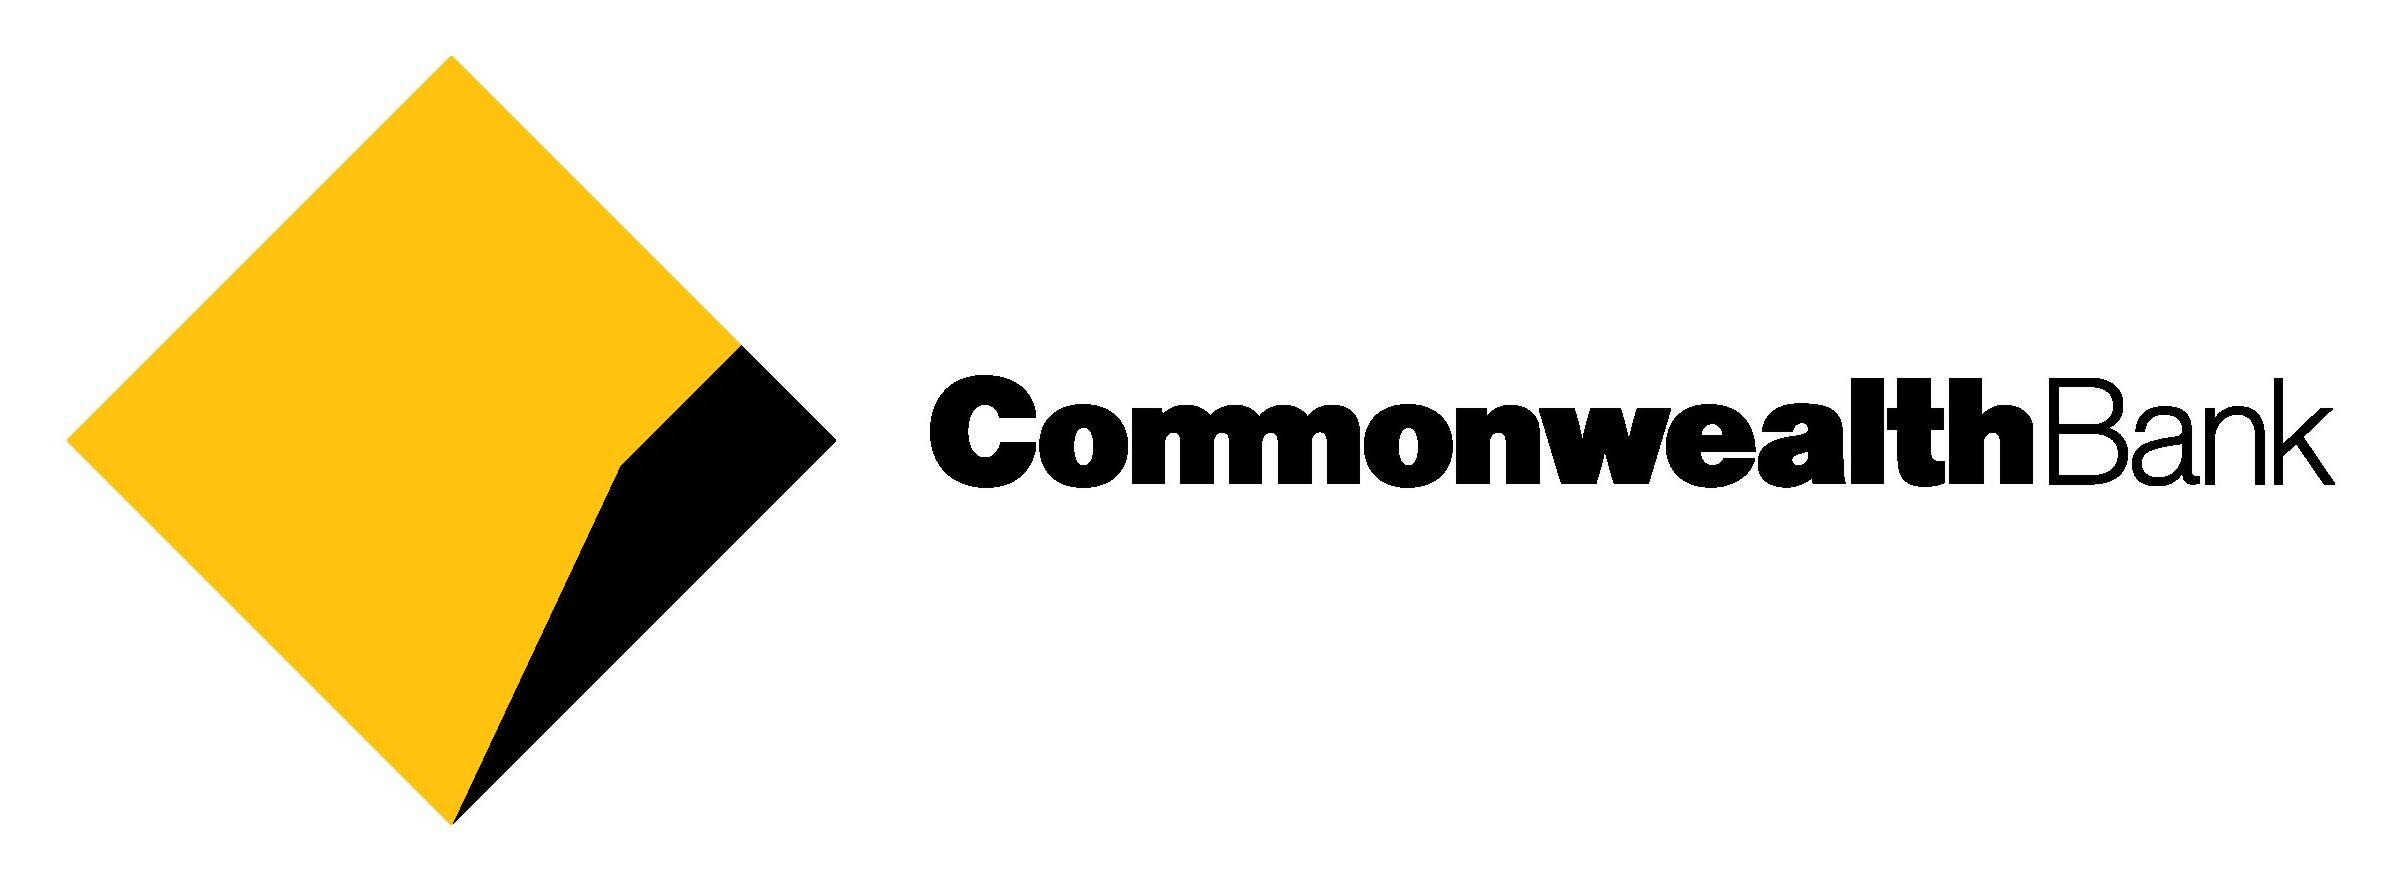 old-commonwealth-bank-logo